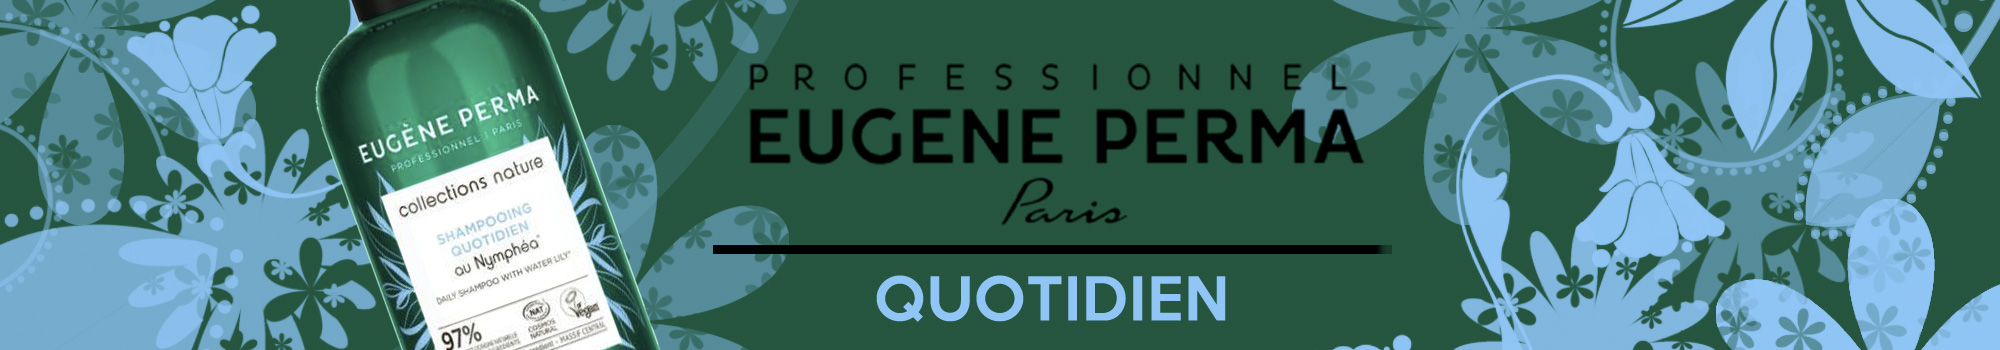 Collections Nature Quotidien Eugène Perma